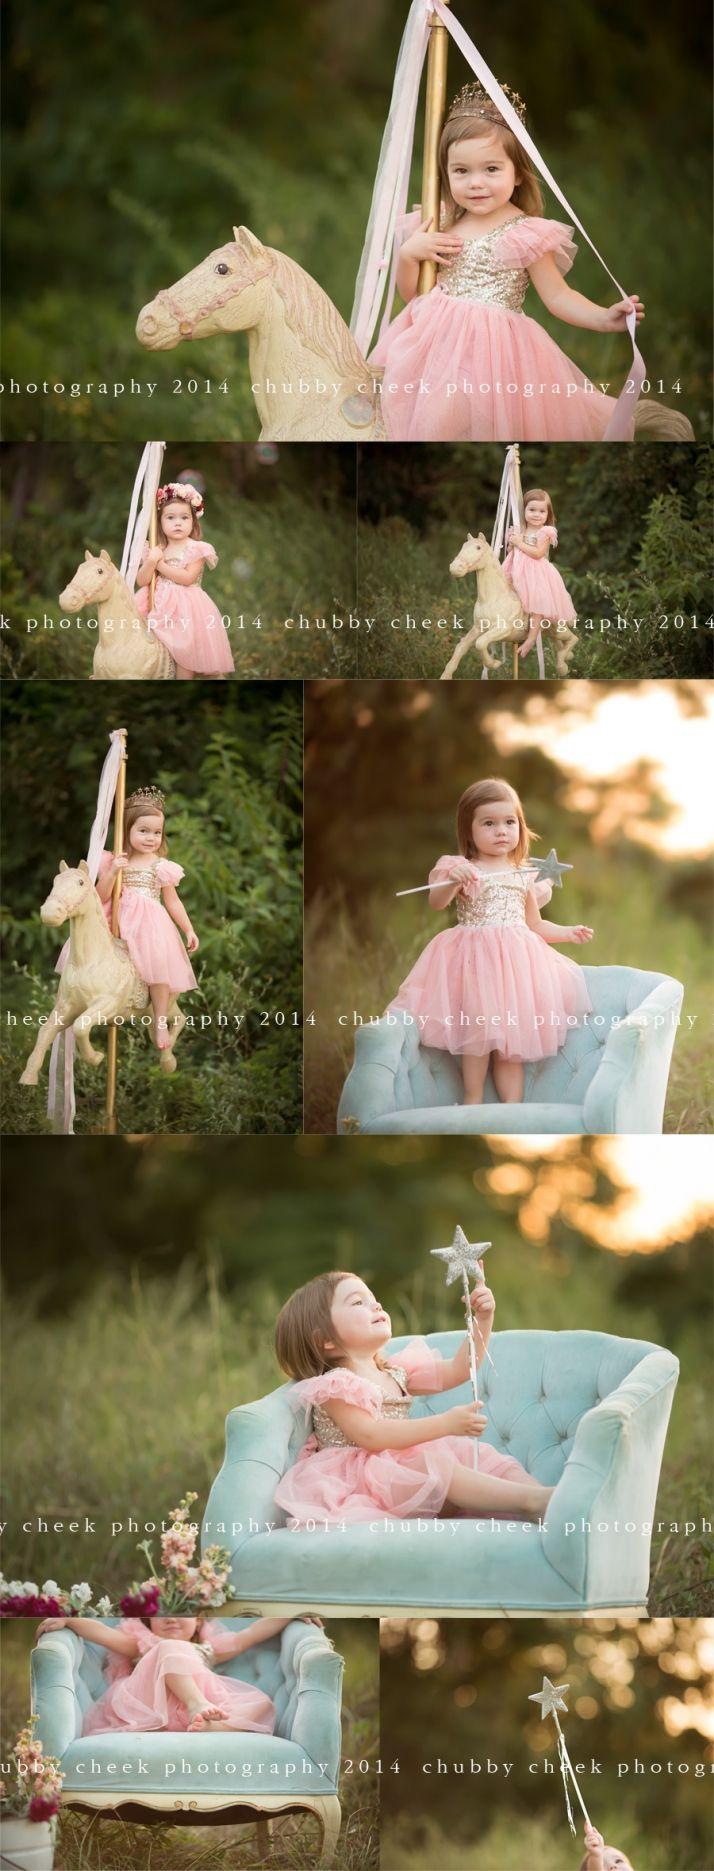 tombal tx child photographer chubby cheek photography